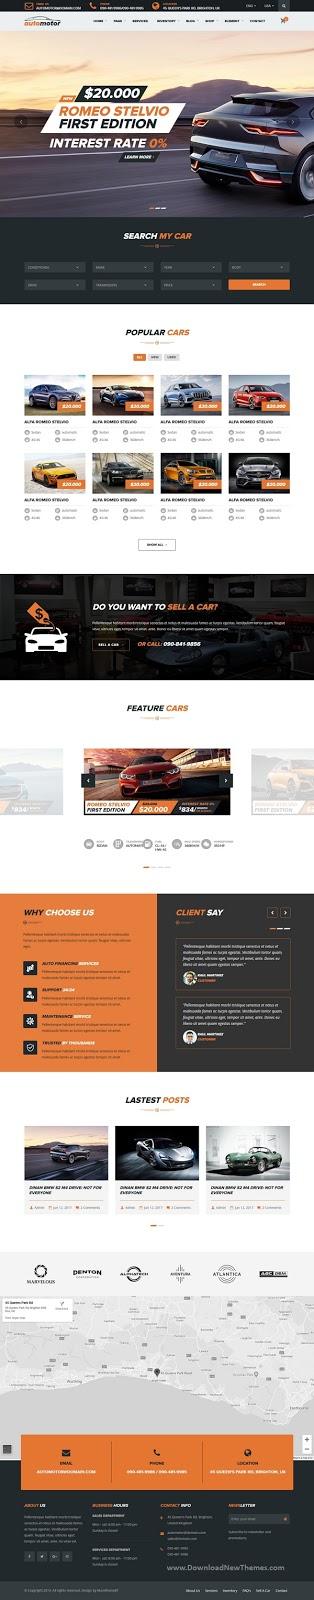 AutoMotor - Car Dealer & Services HTML5 Template